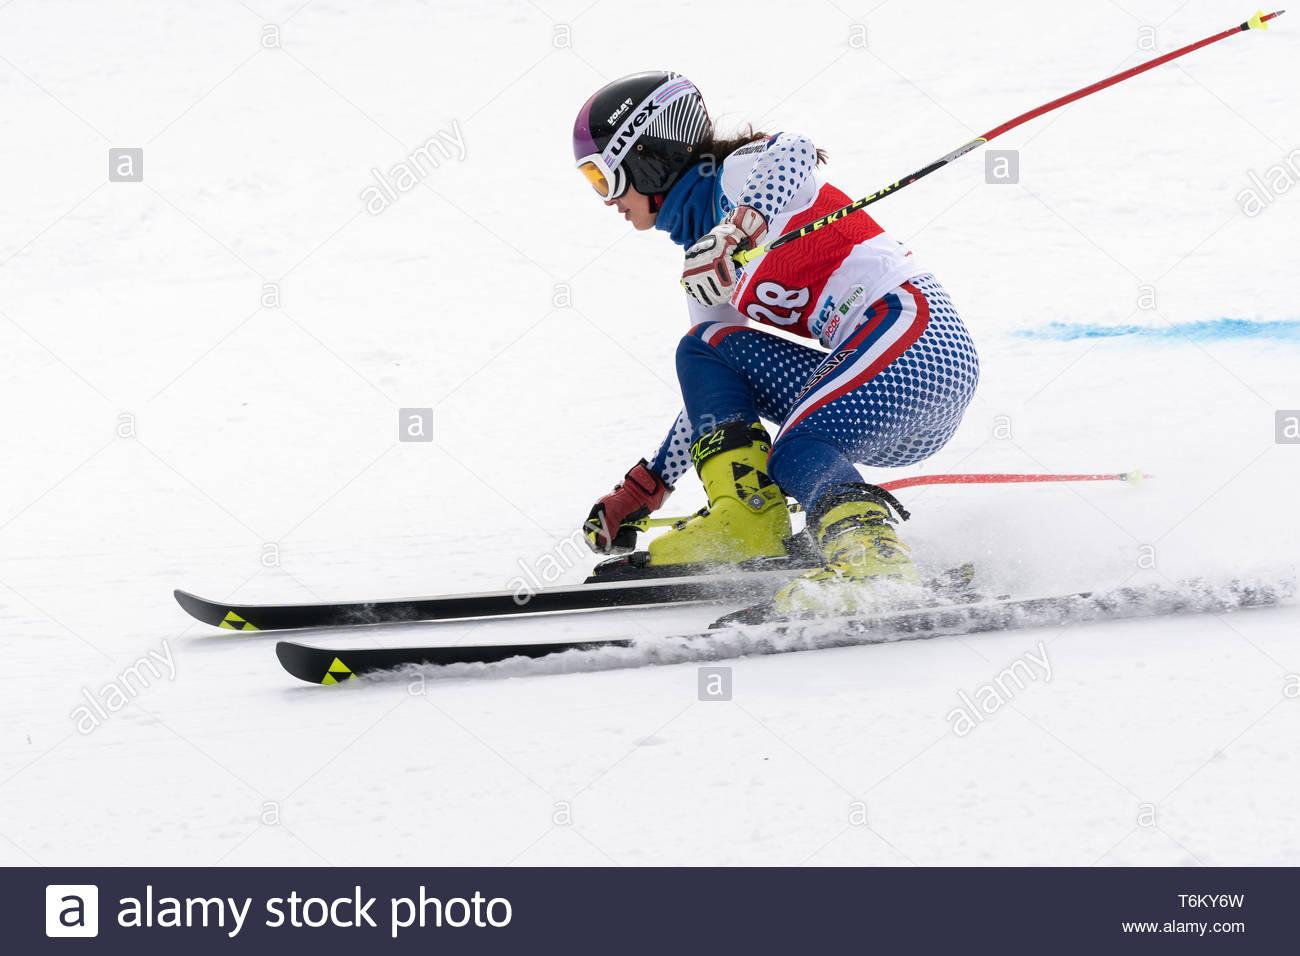 KAMCHATKA PENINSULA, RUSSIA - APRIL 2, 2019: Russian Women's Alpine Skiing Cup, International Ski Federation Championship - giant slalom. Mountain ski - Stock Image